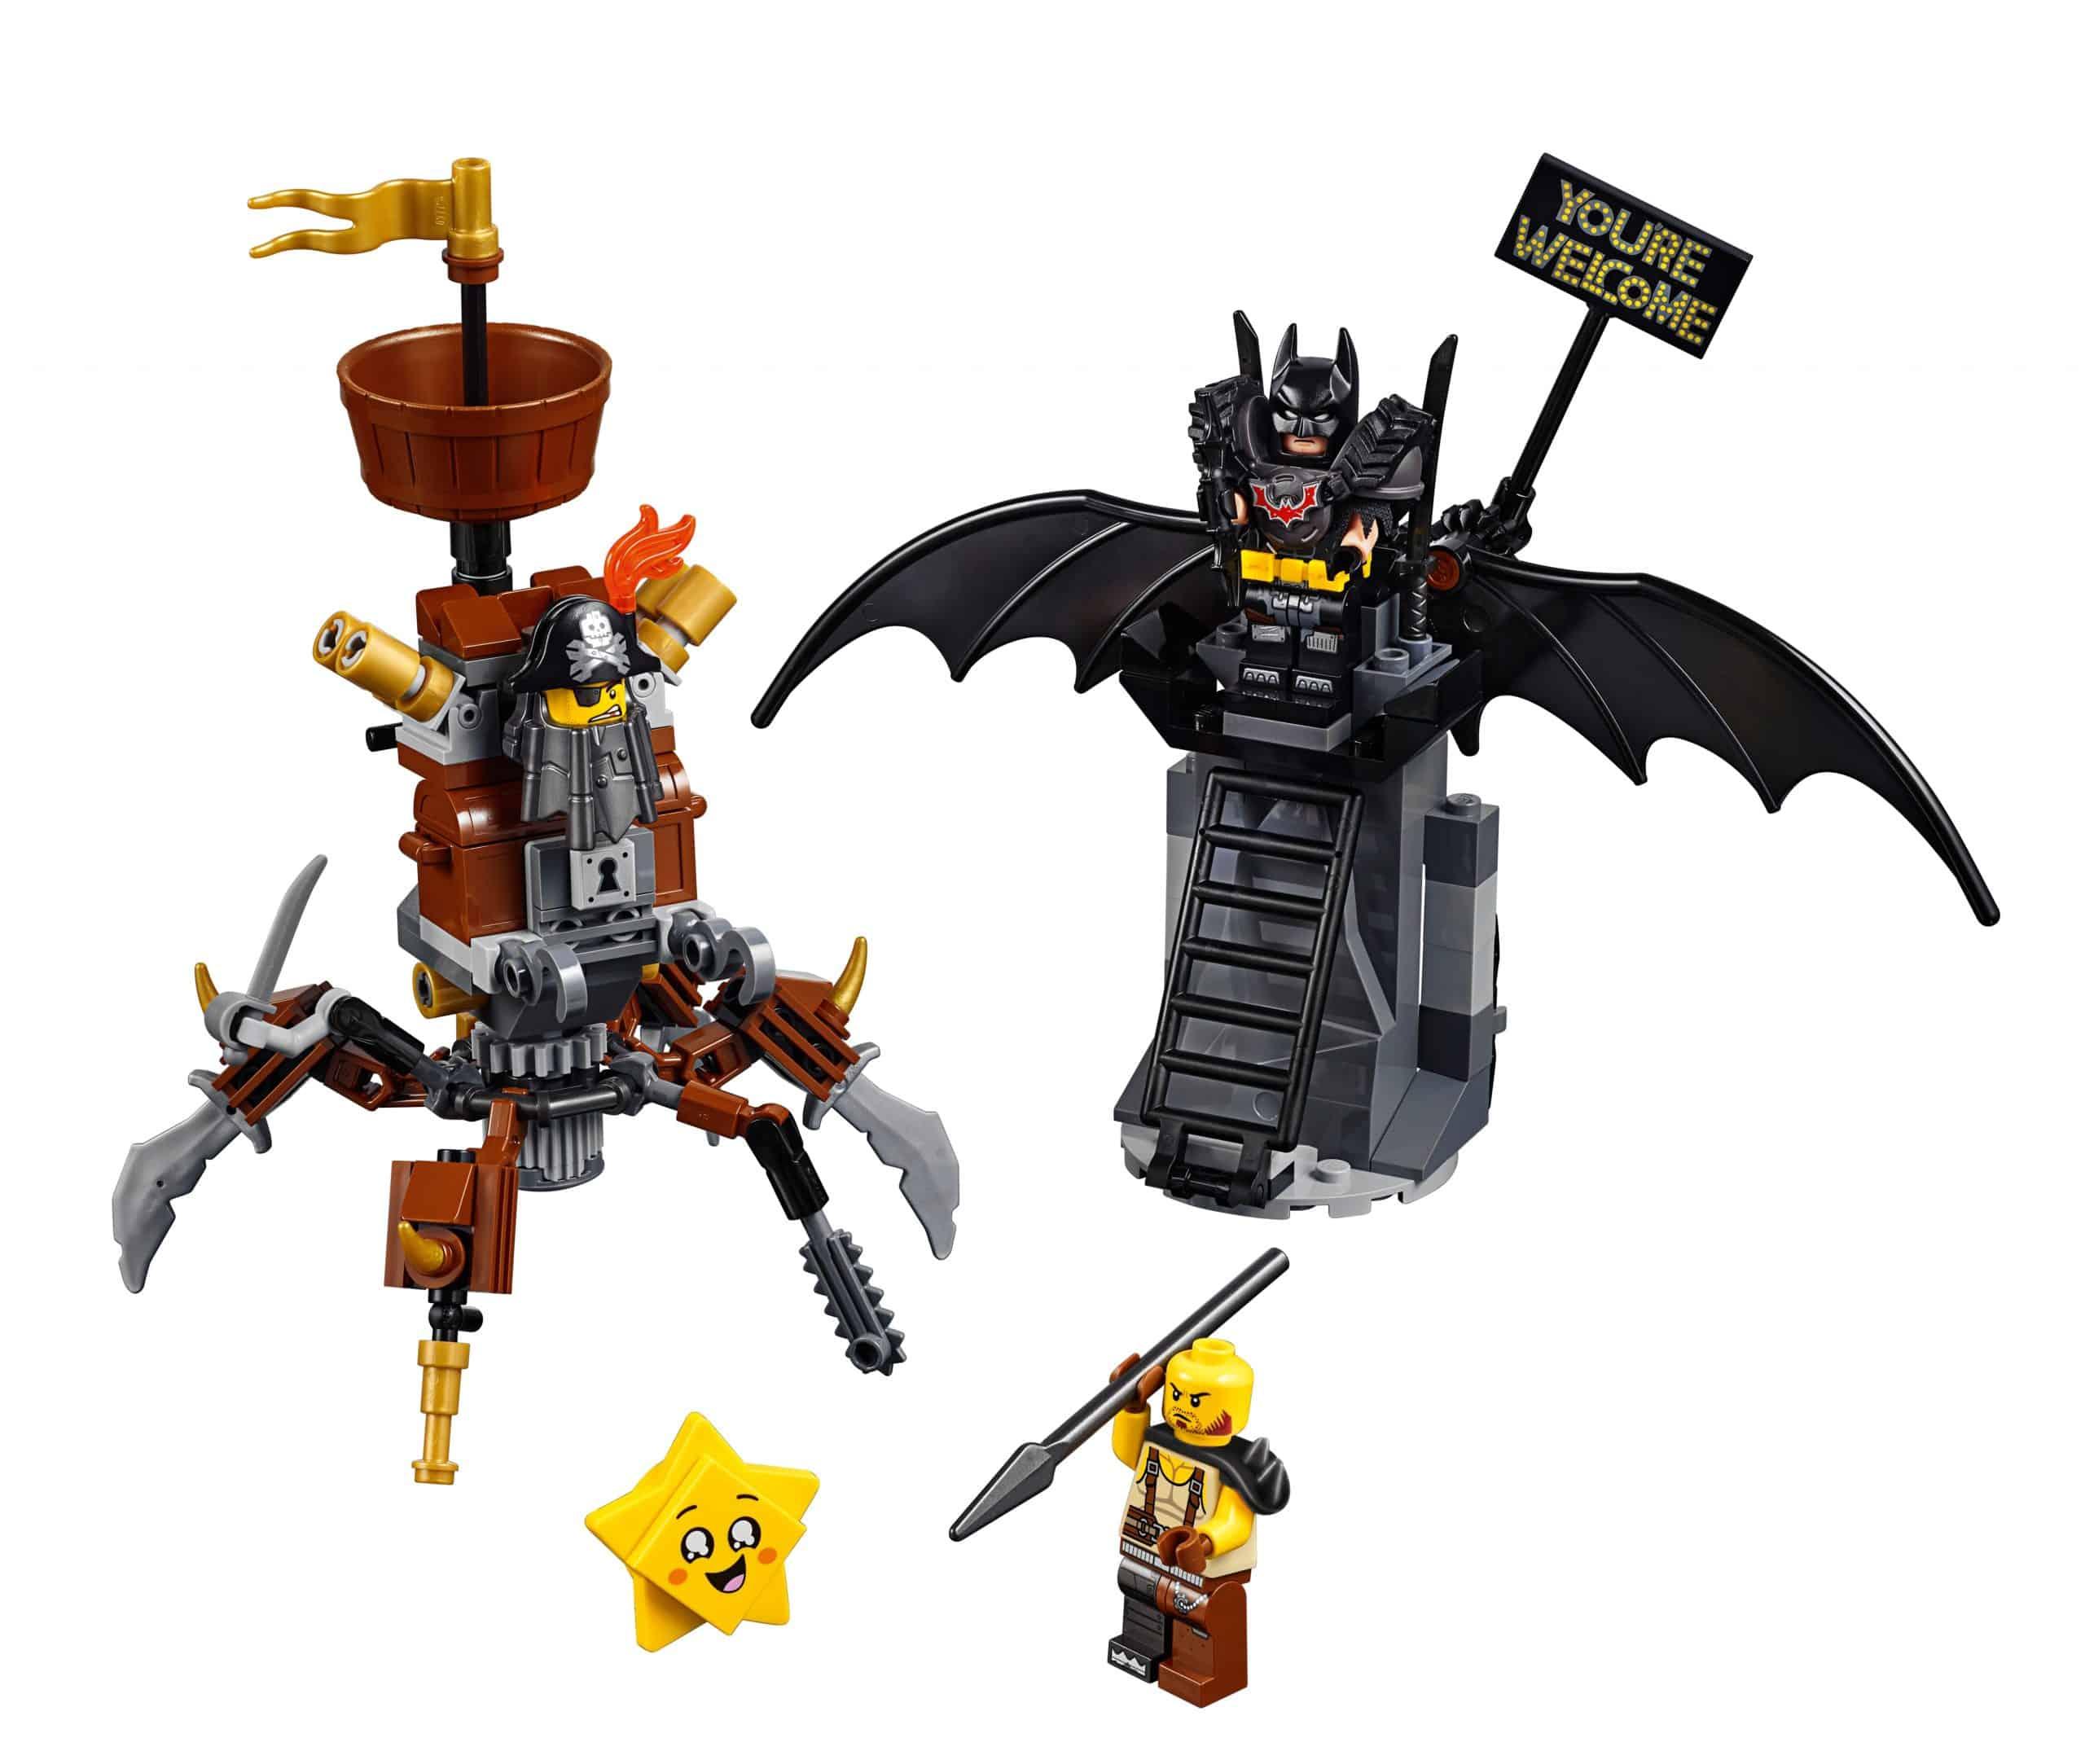 lego gevechtsklare batman en metaalbaard 70836 scaled